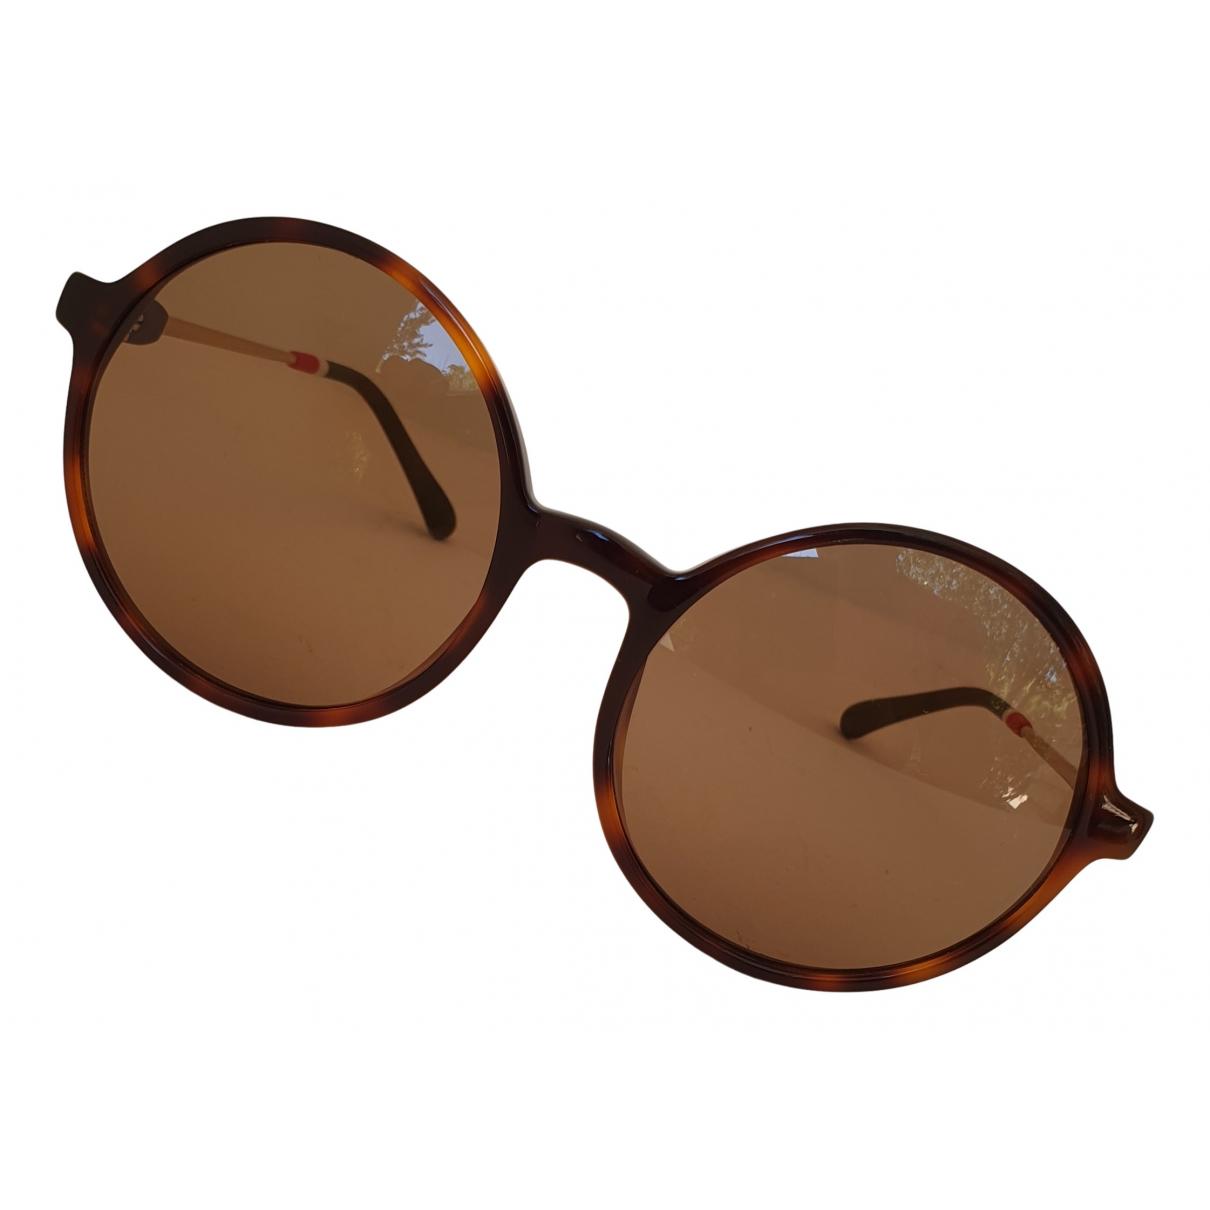 Orlebar Brown - Lunettes   pour homme - marron